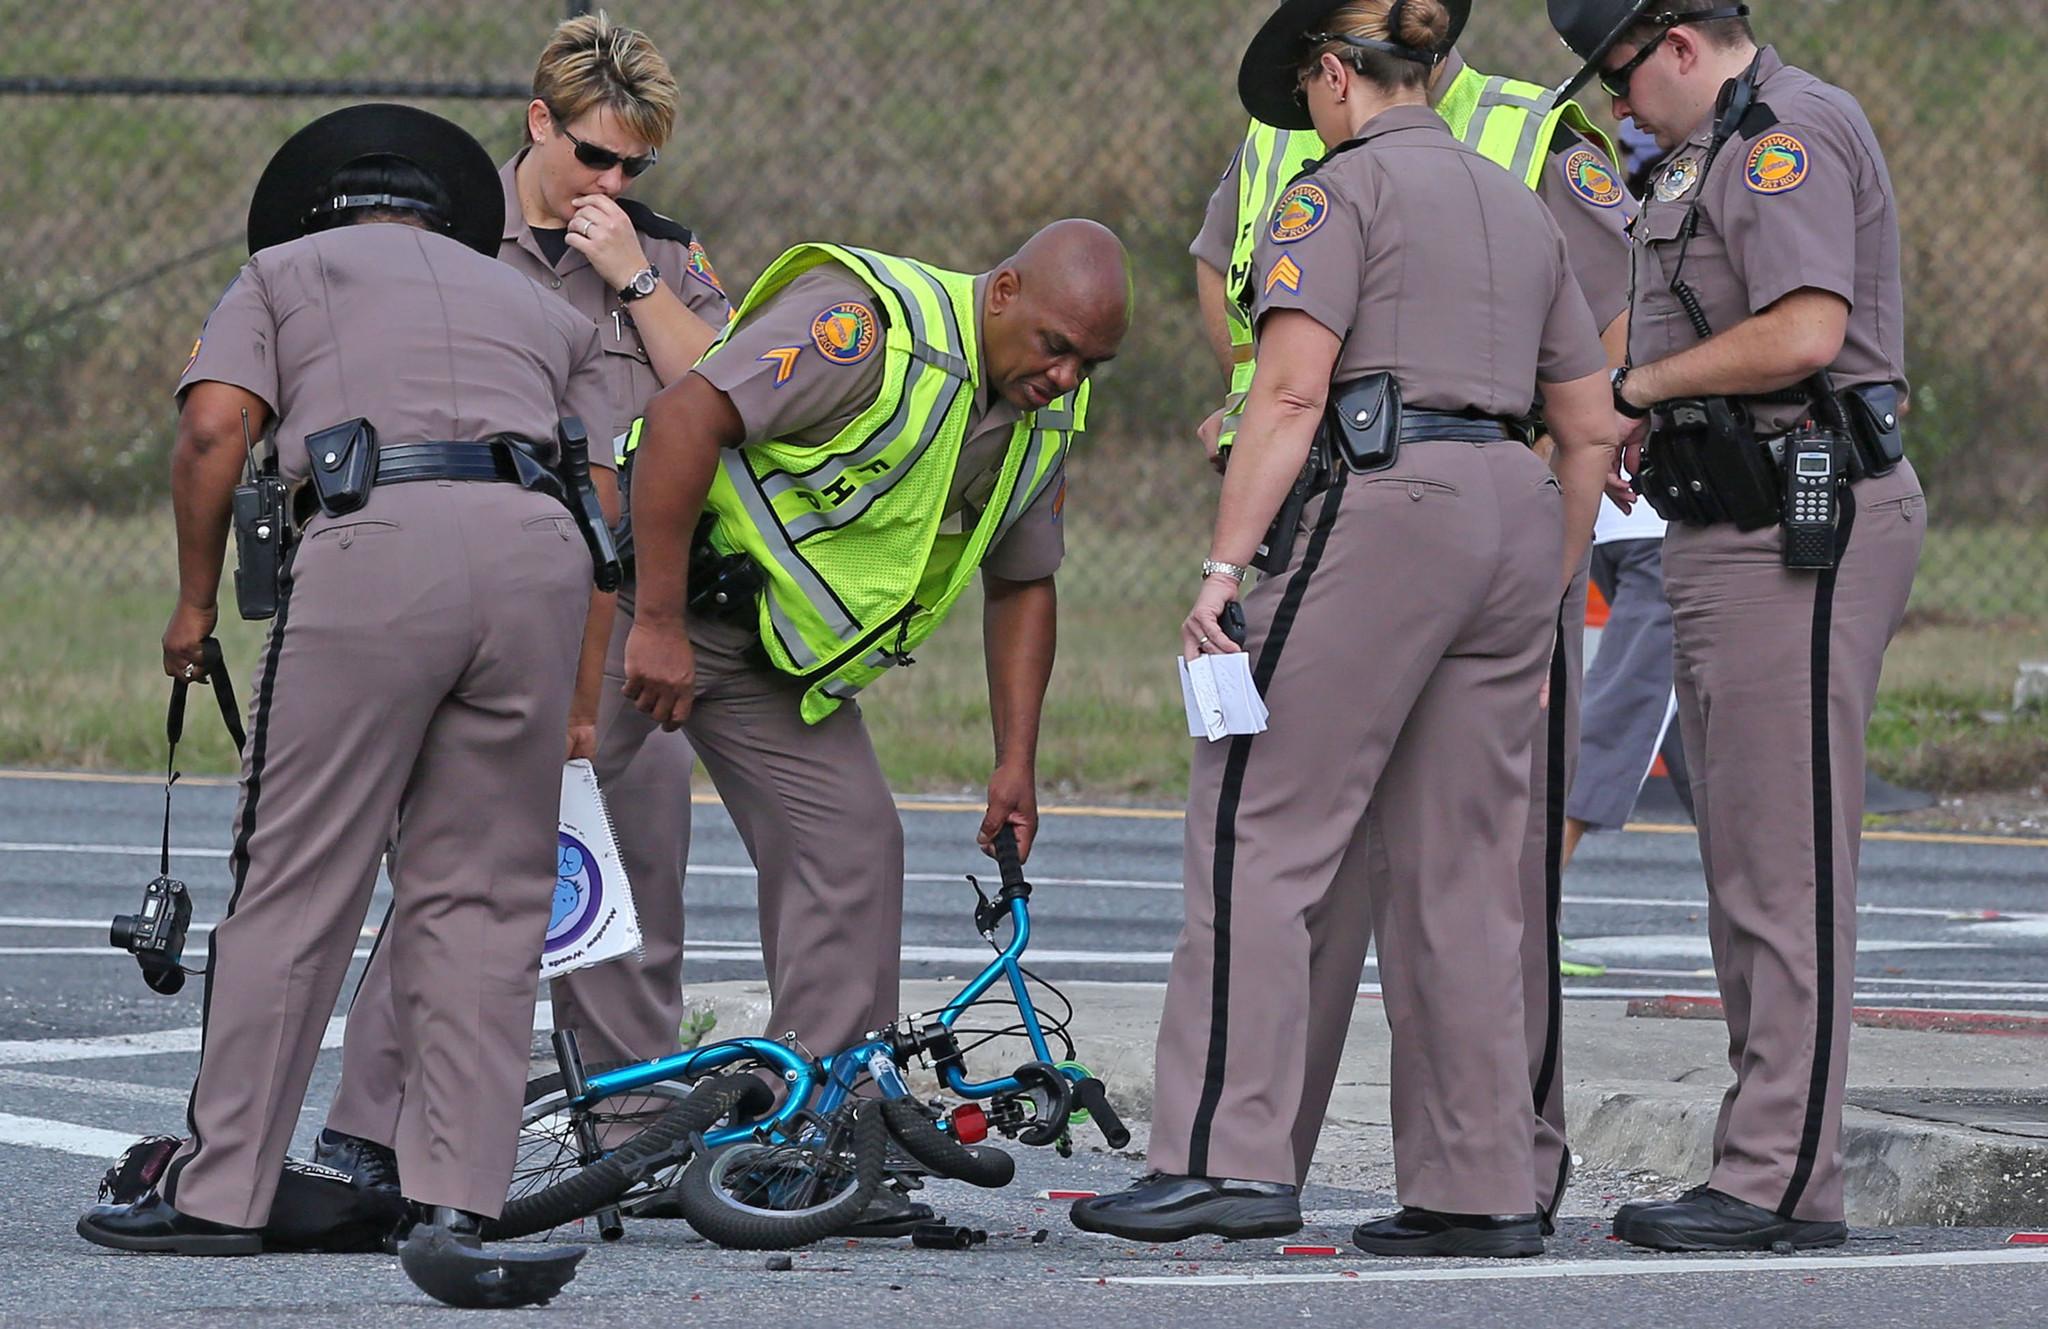 6 Year Old Boy On Bike Hit Killed By Tractor Trailer Near